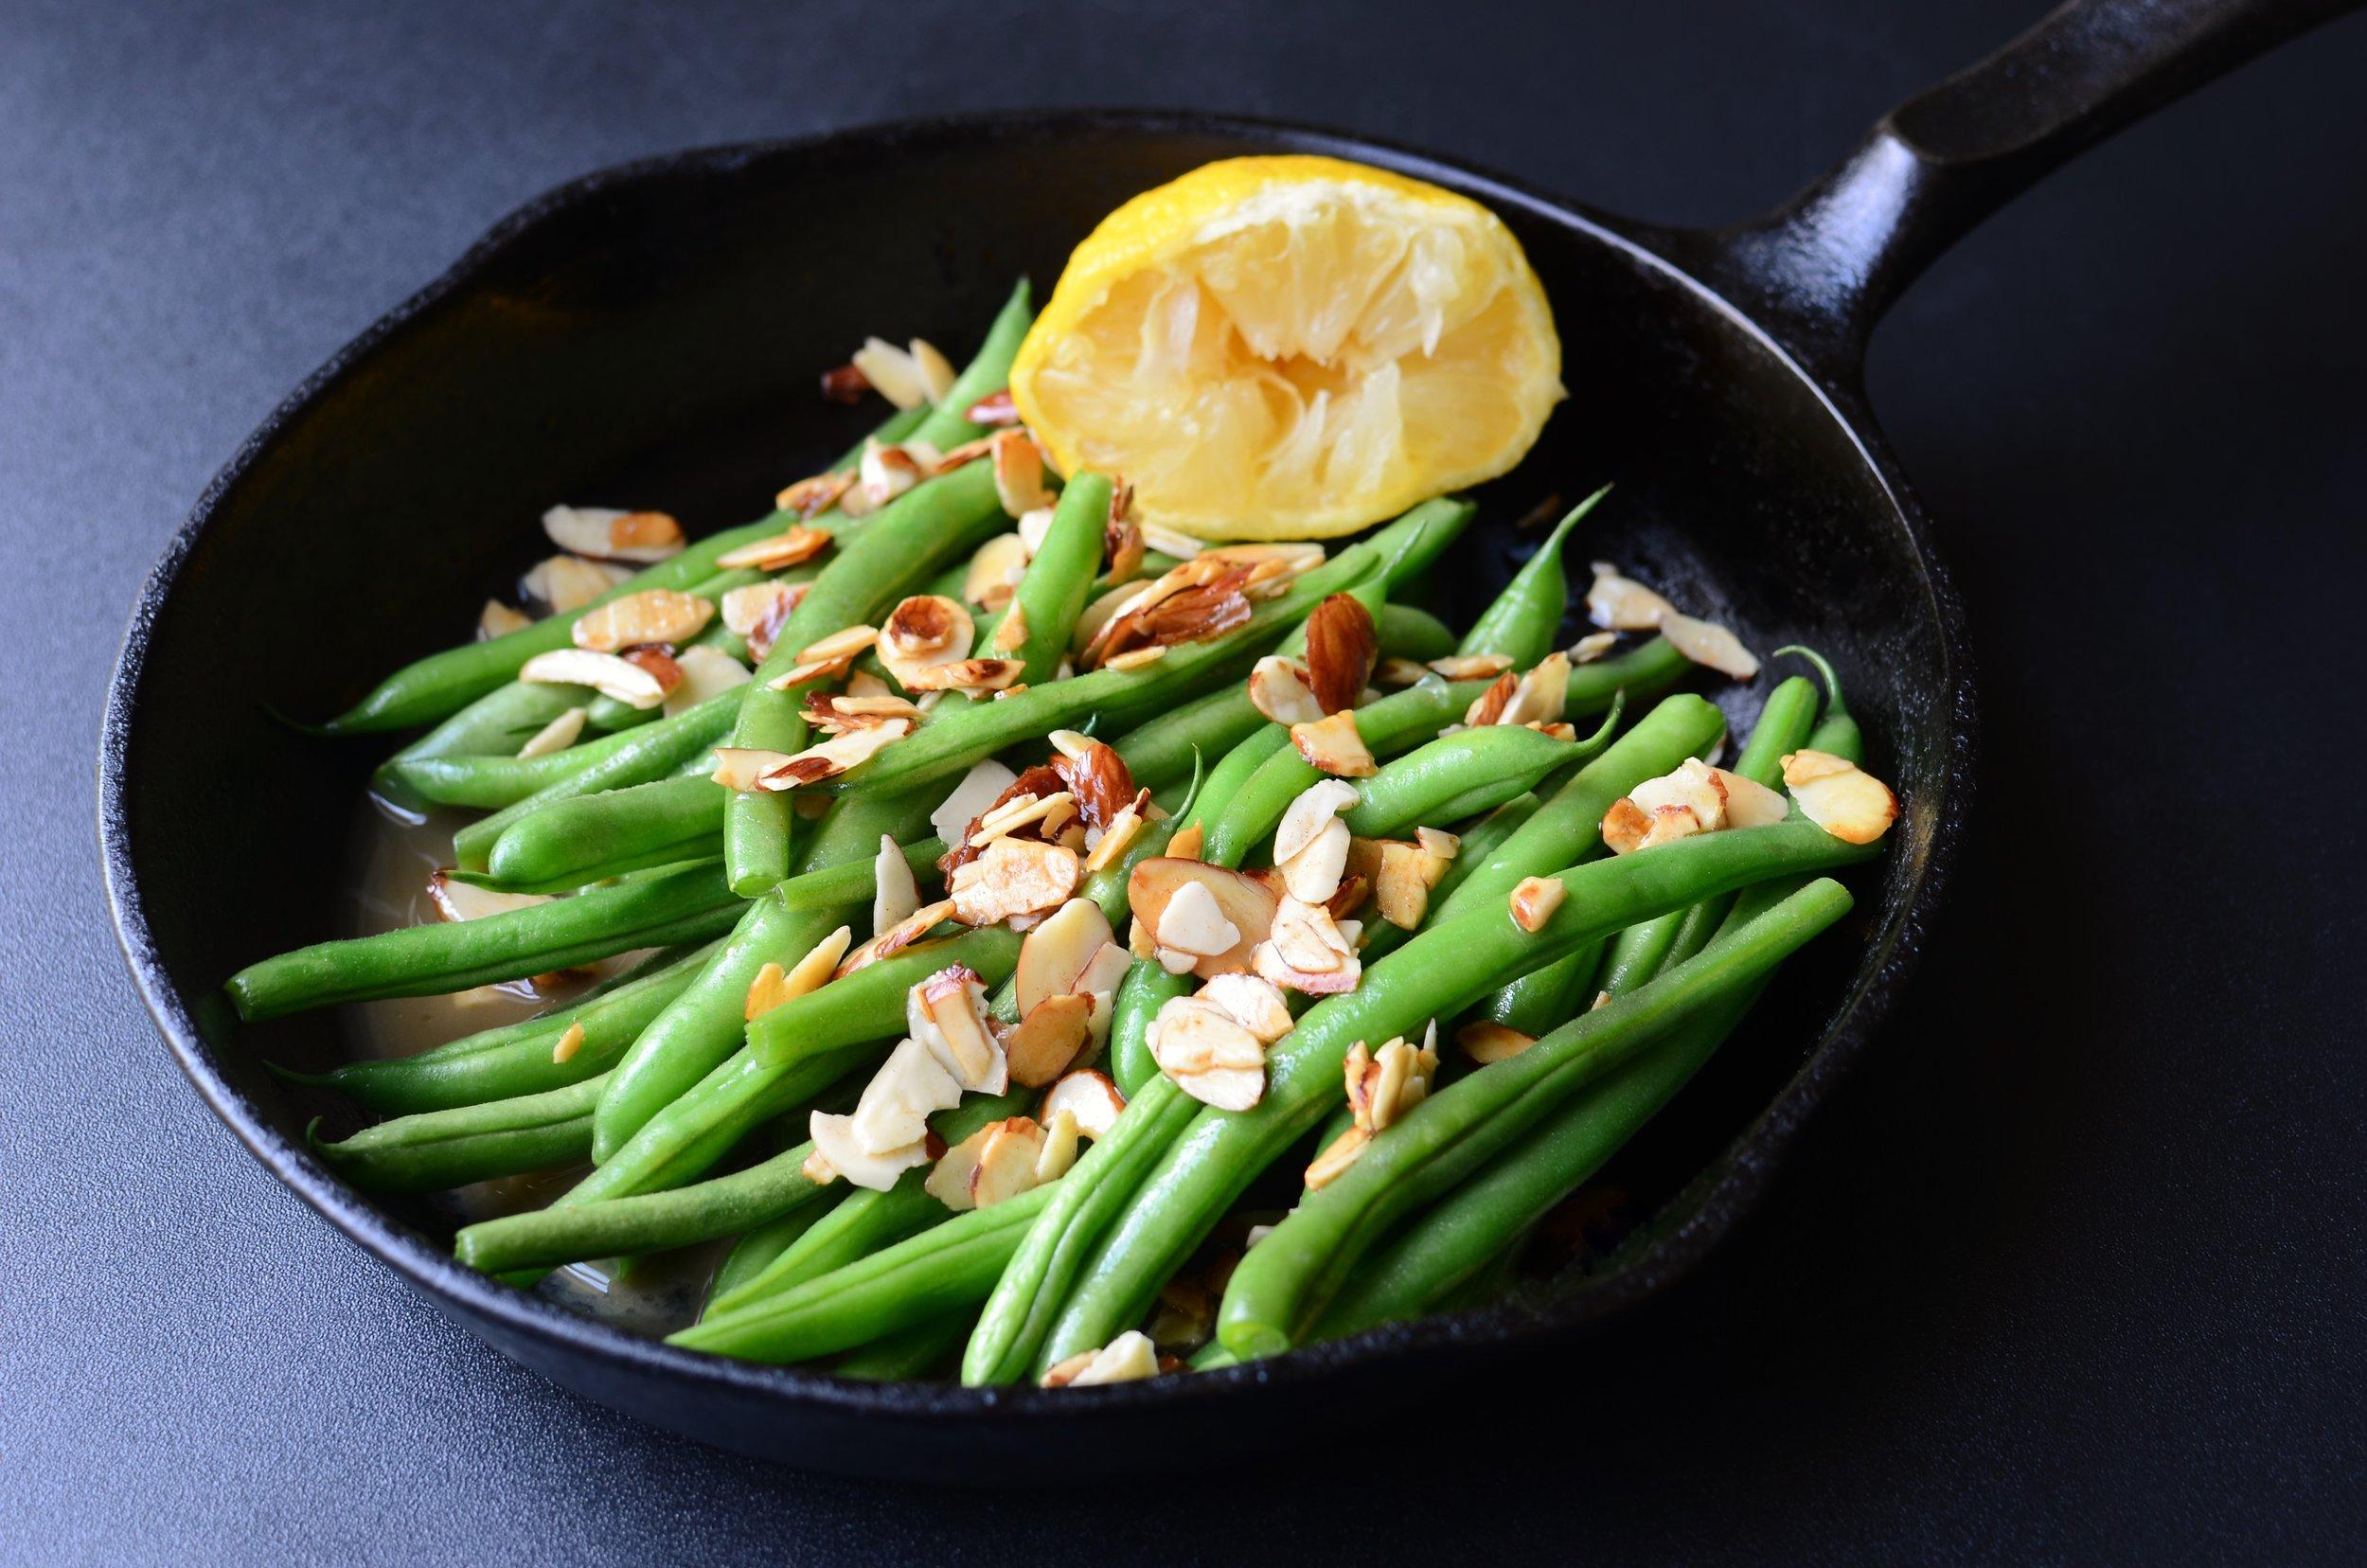 Green Beans Almondine Recipe and How-to Photos (Almandine)